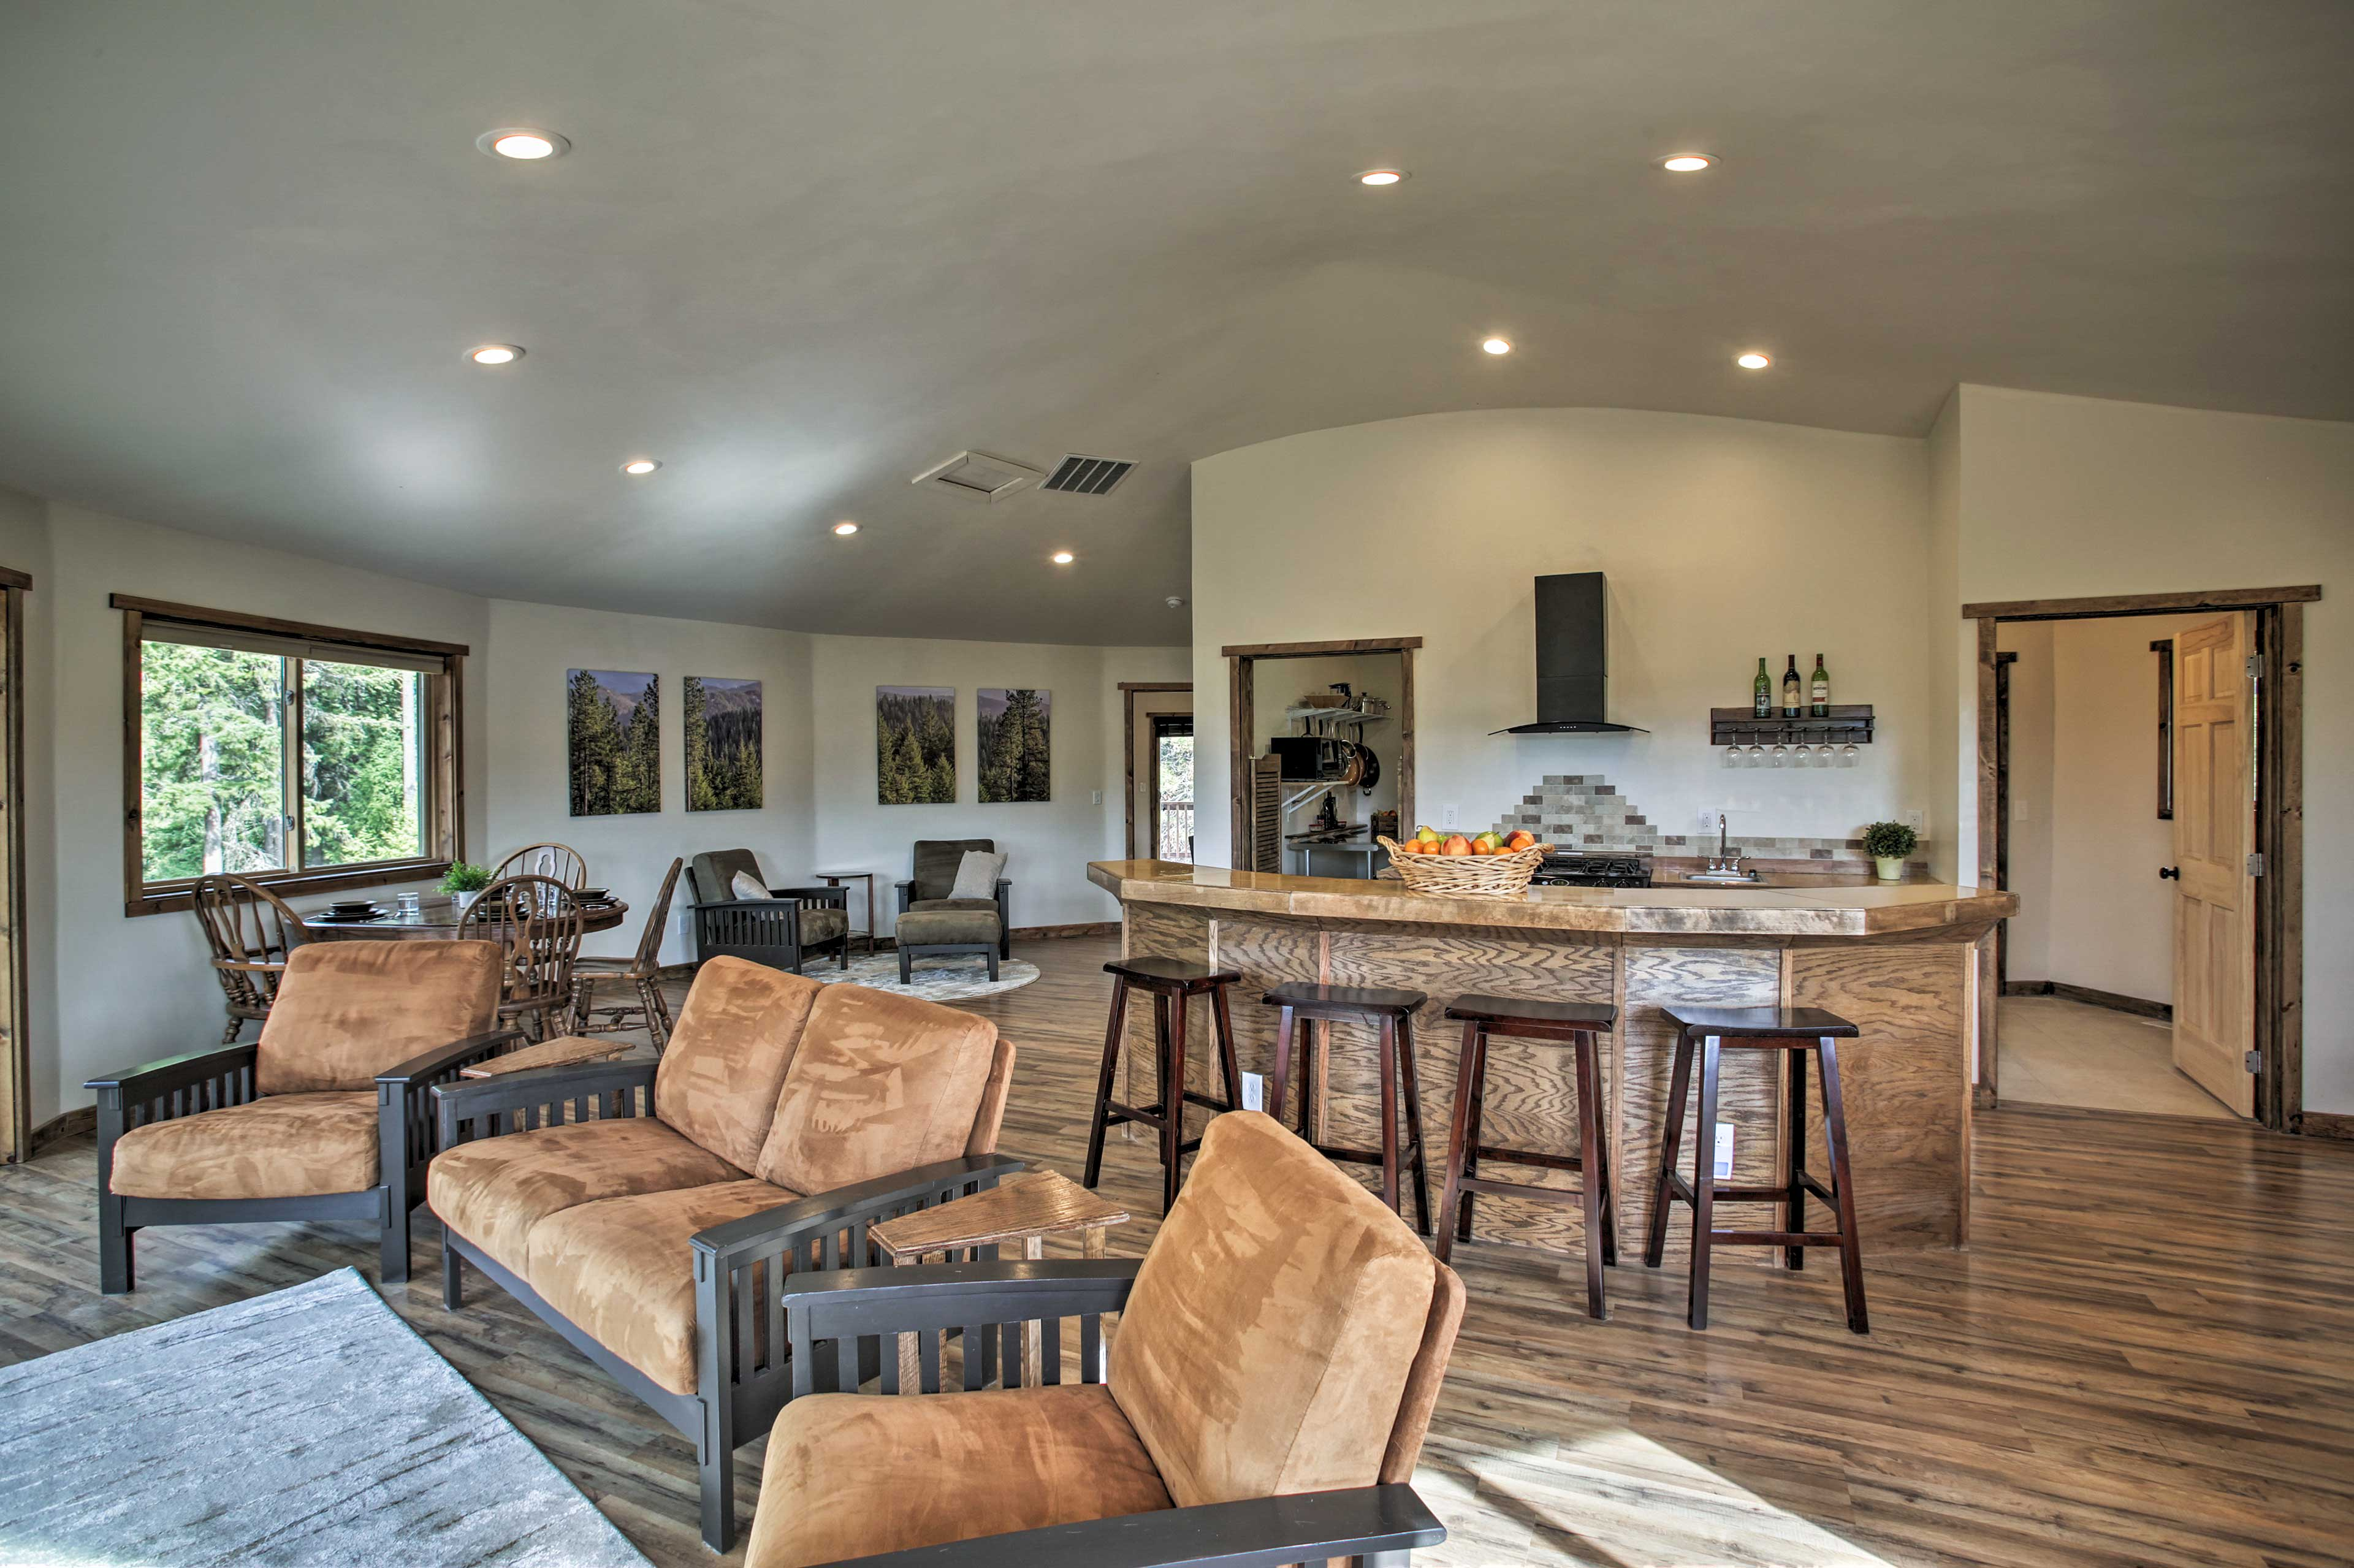 Sleek hardwood floors fill the interior.